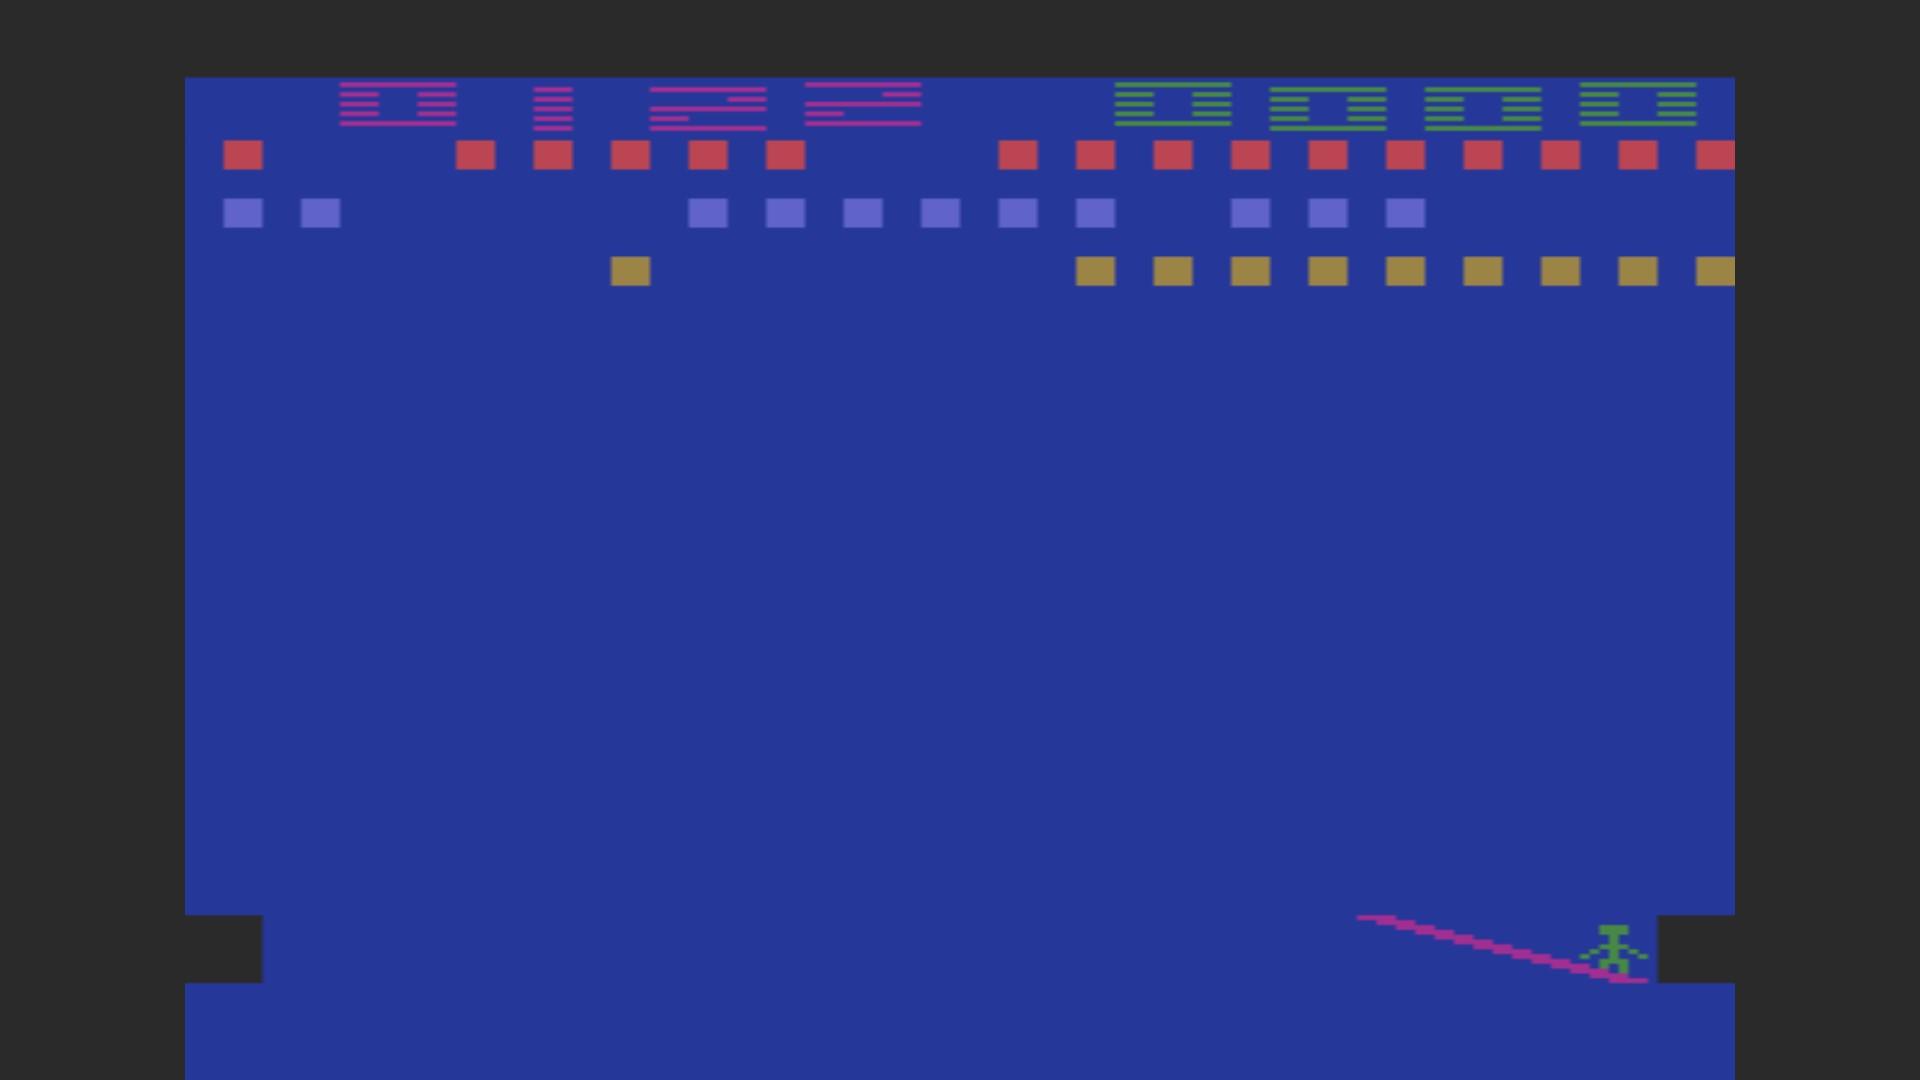 AkinNahtanoj: Circus Atari (Atari 2600 Emulated Novice/B Mode) 122 points on 2020-10-14 03:36:25